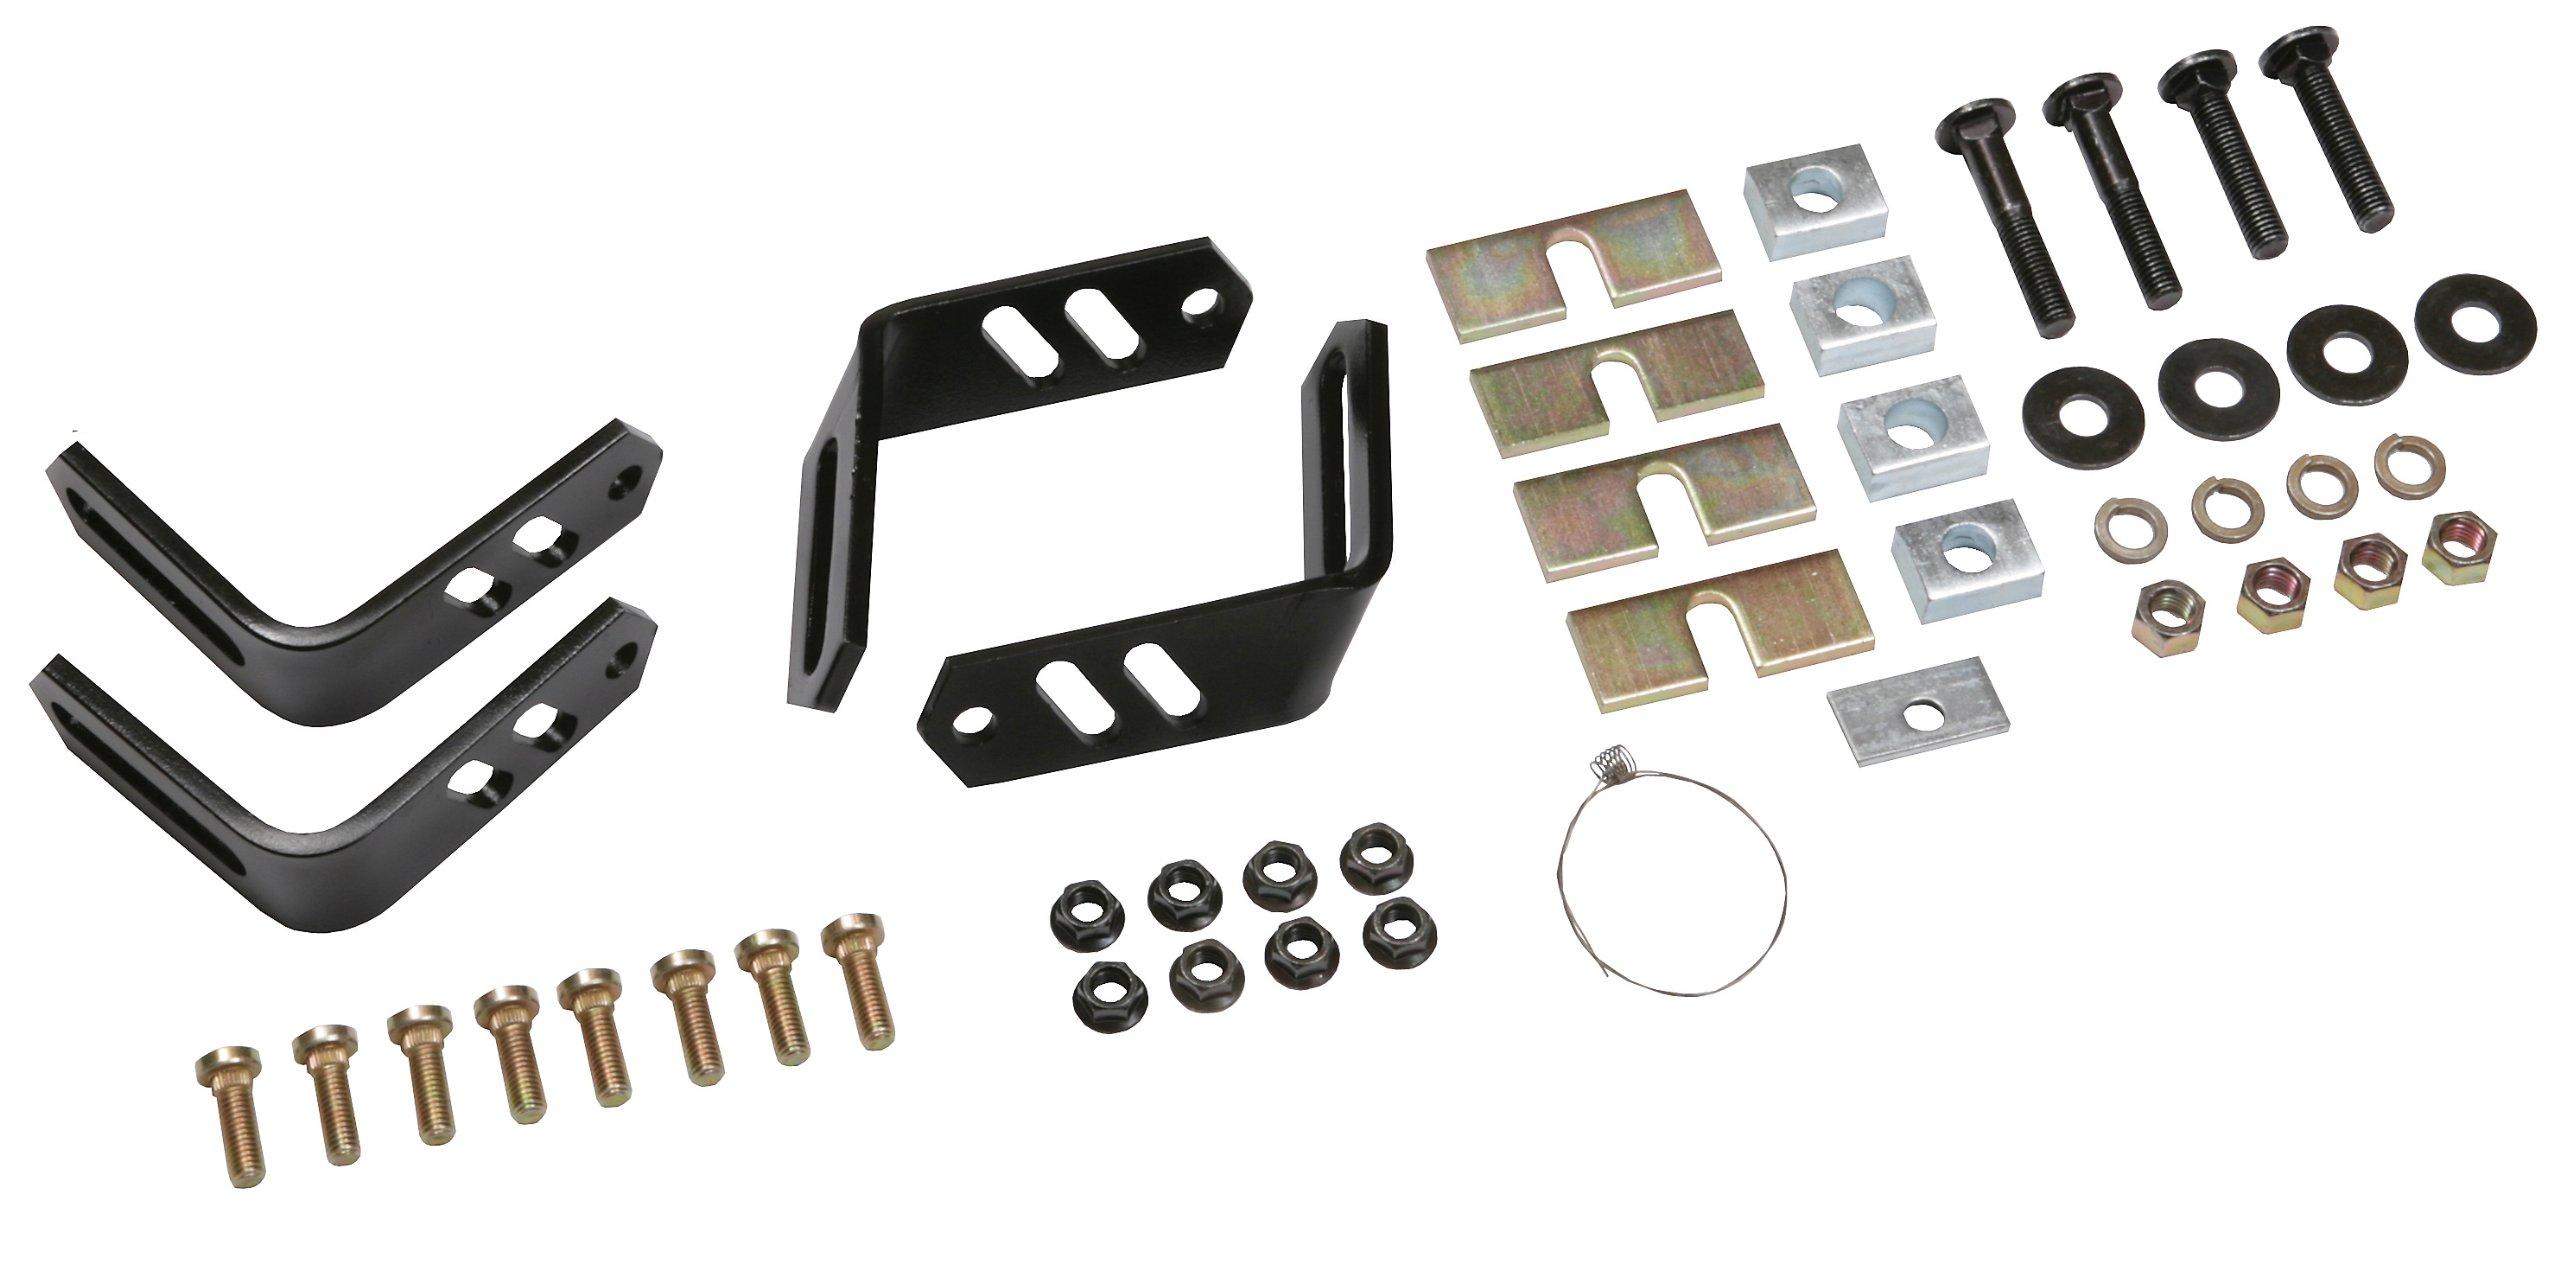 Husky 31563 Universal Fifth Wheel Install Hardware kit by Husky